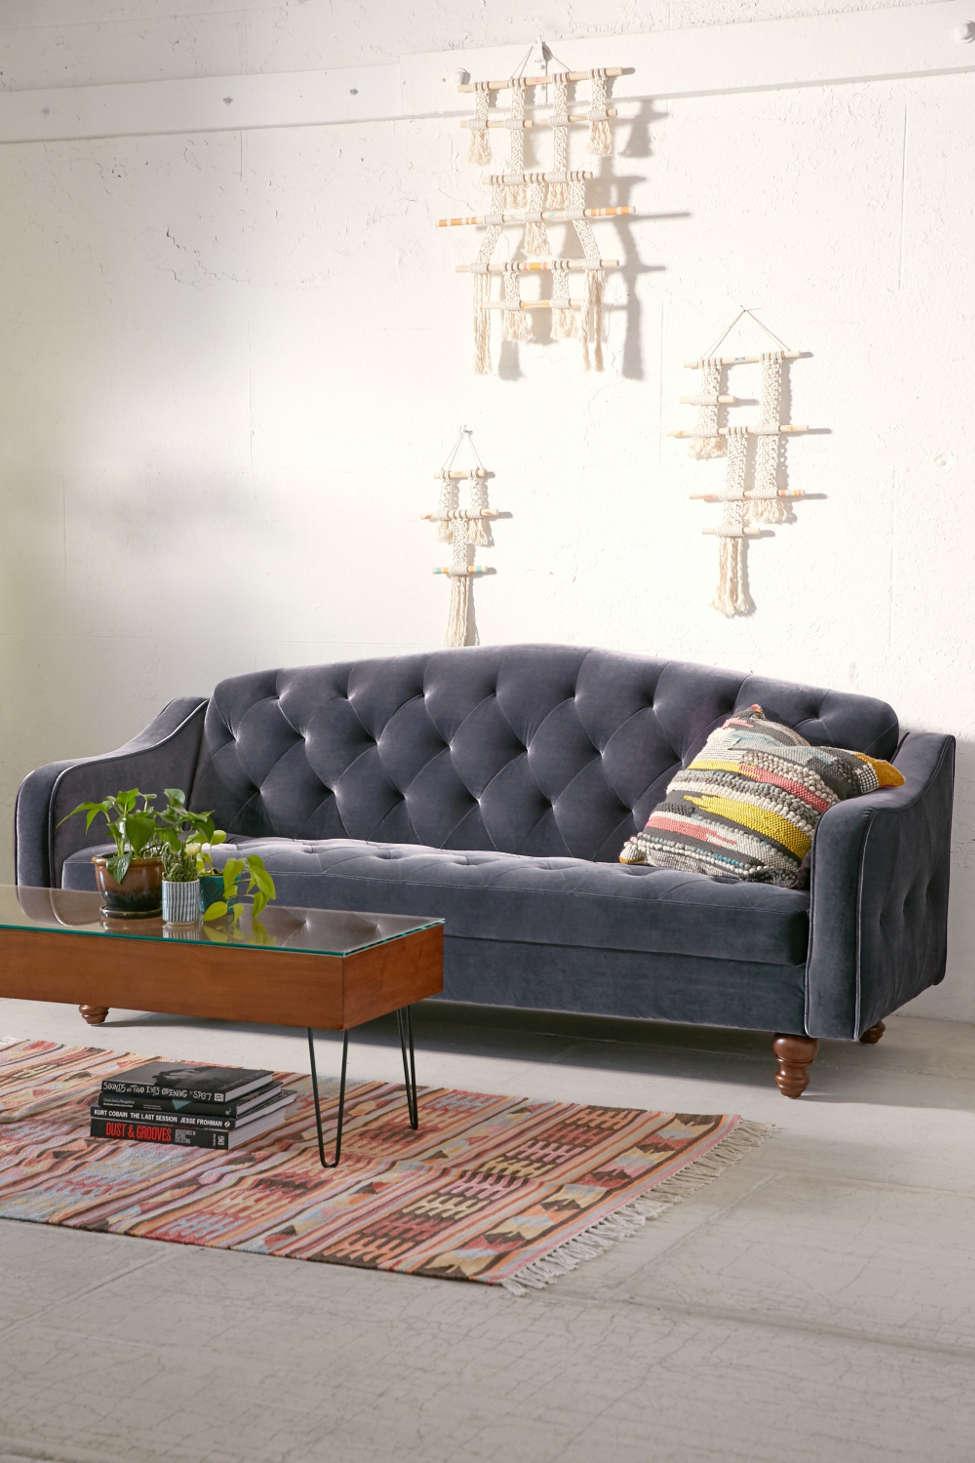 Sofa Dreaming Techie 39 S Diy Adventures